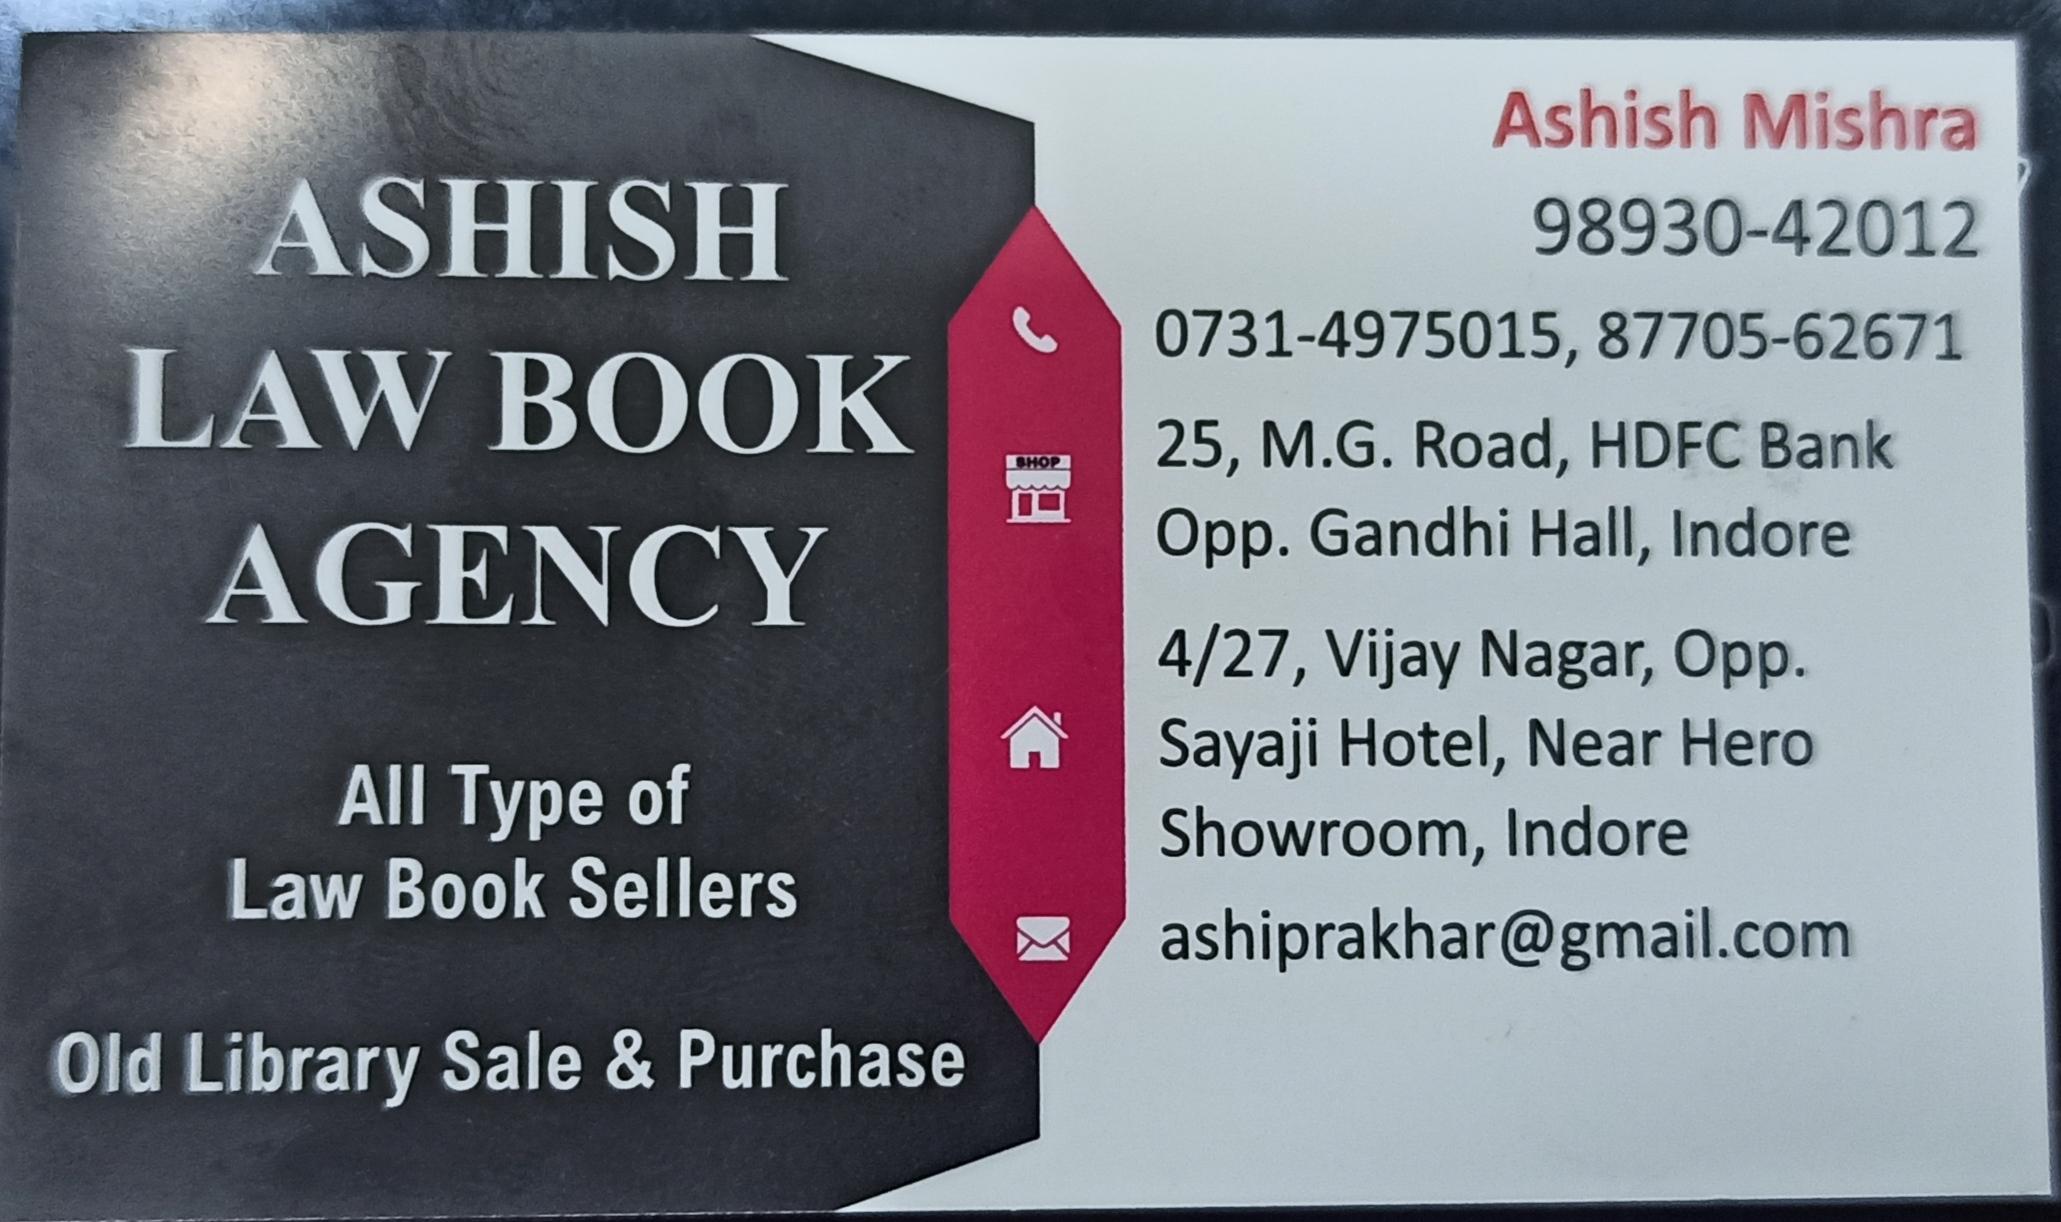 Ashish law book agency